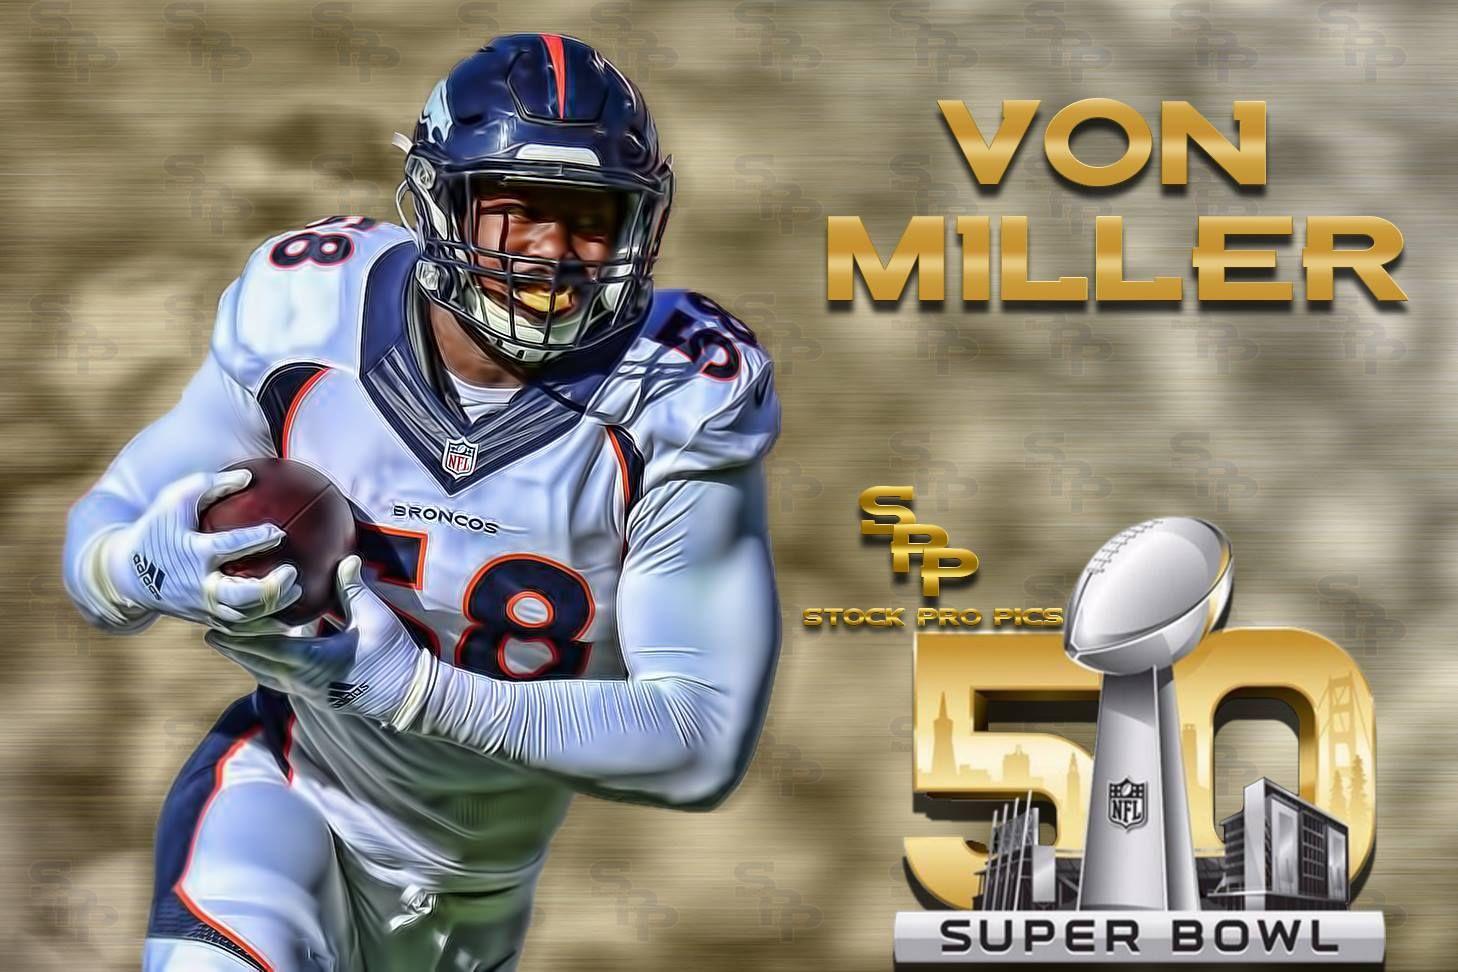 Von Miller Superbowl 50 s and for